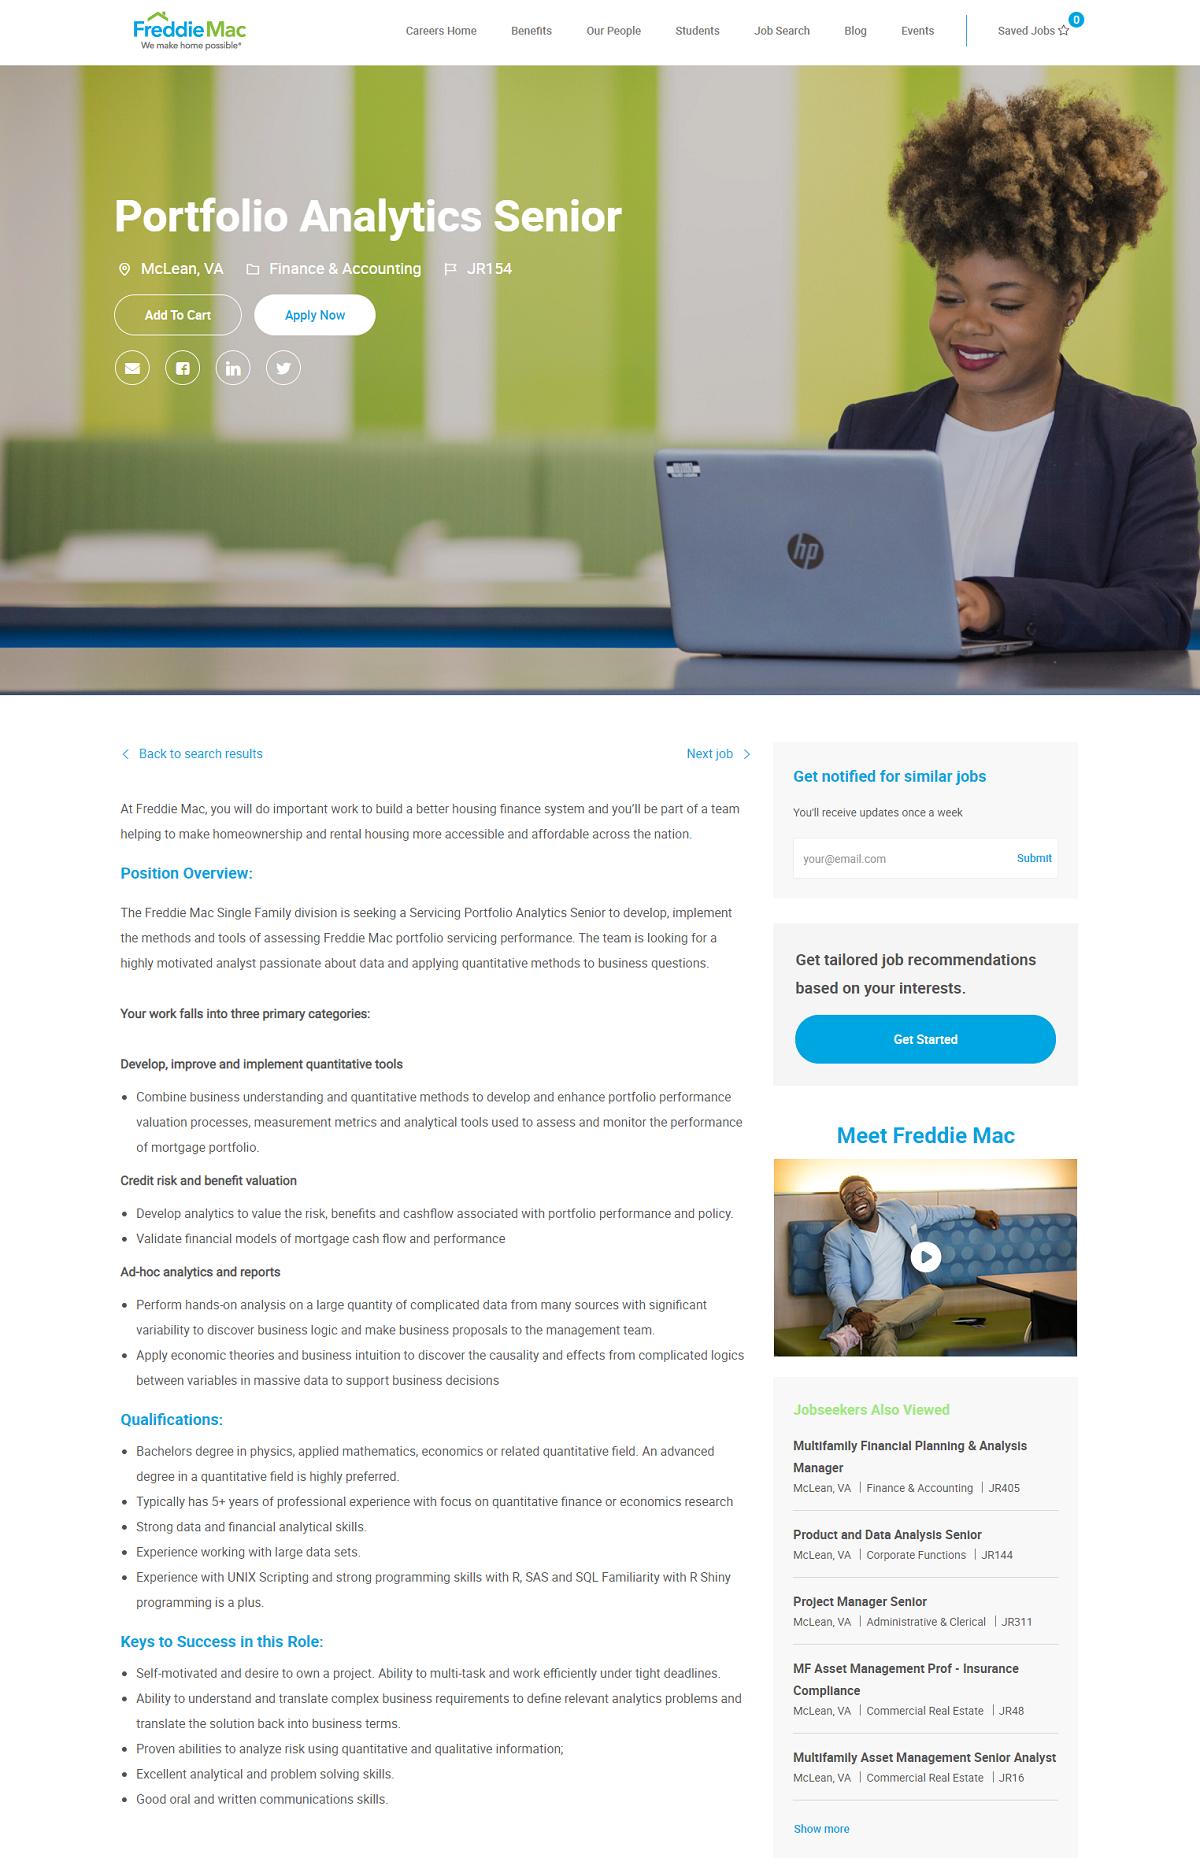 freddie mac brassring job page overlay